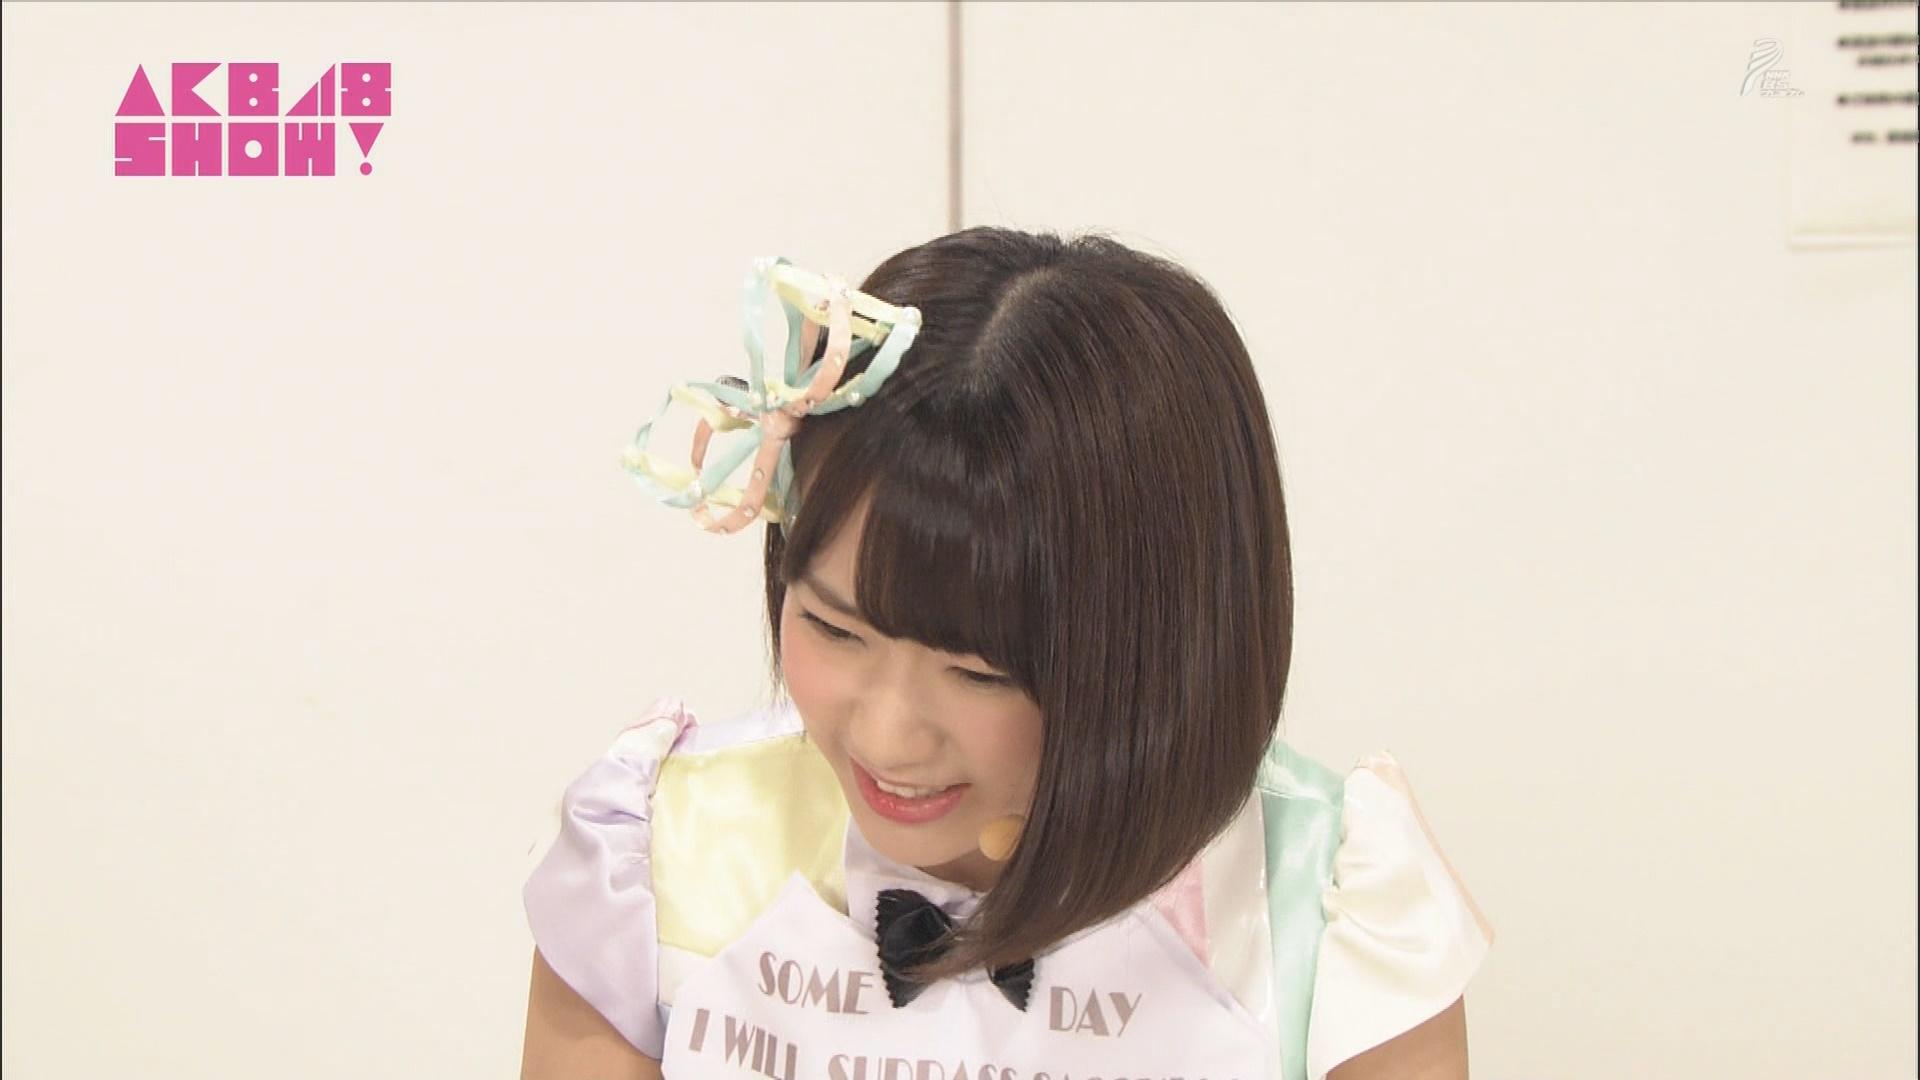 AKB48SHOW 心のプラカード 宮脇咲良 20140830 (6)